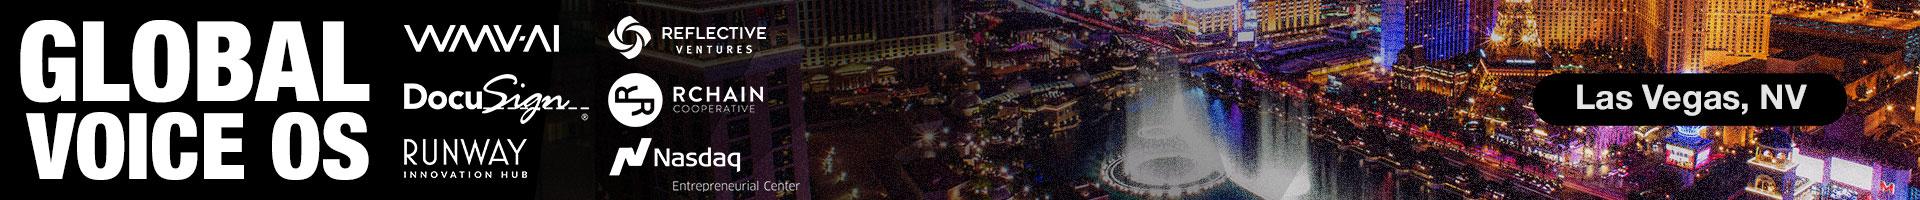 Event-Global-Voice-OS-1920x200-Las-Vegas-NV